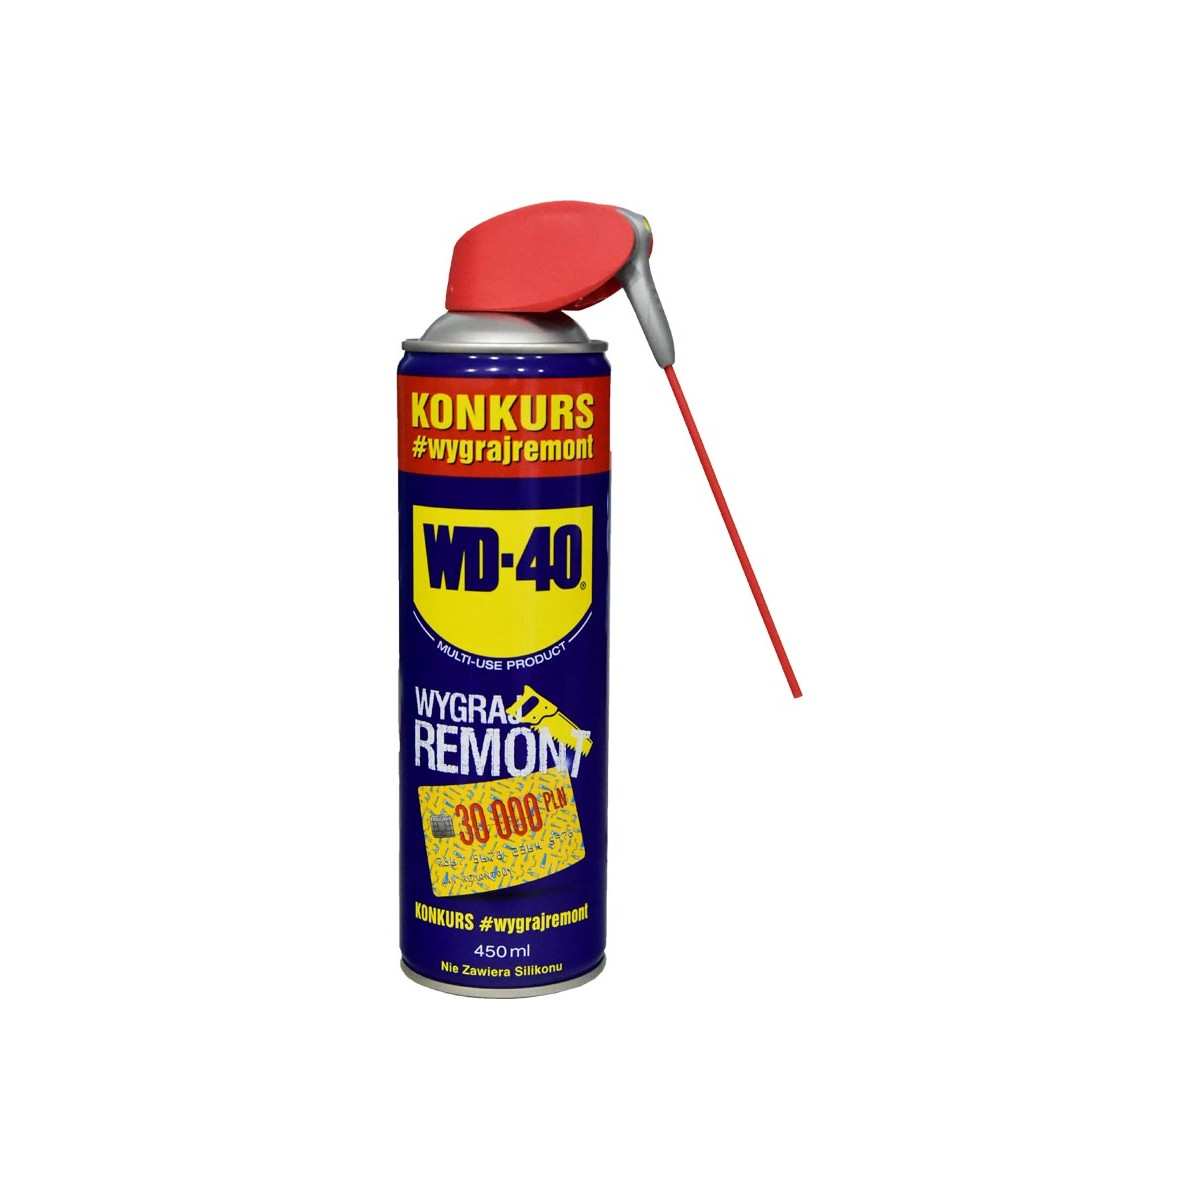 Środek smarujący WD-40 - 450 ml Środek smarujący WD-40 - 450 ml